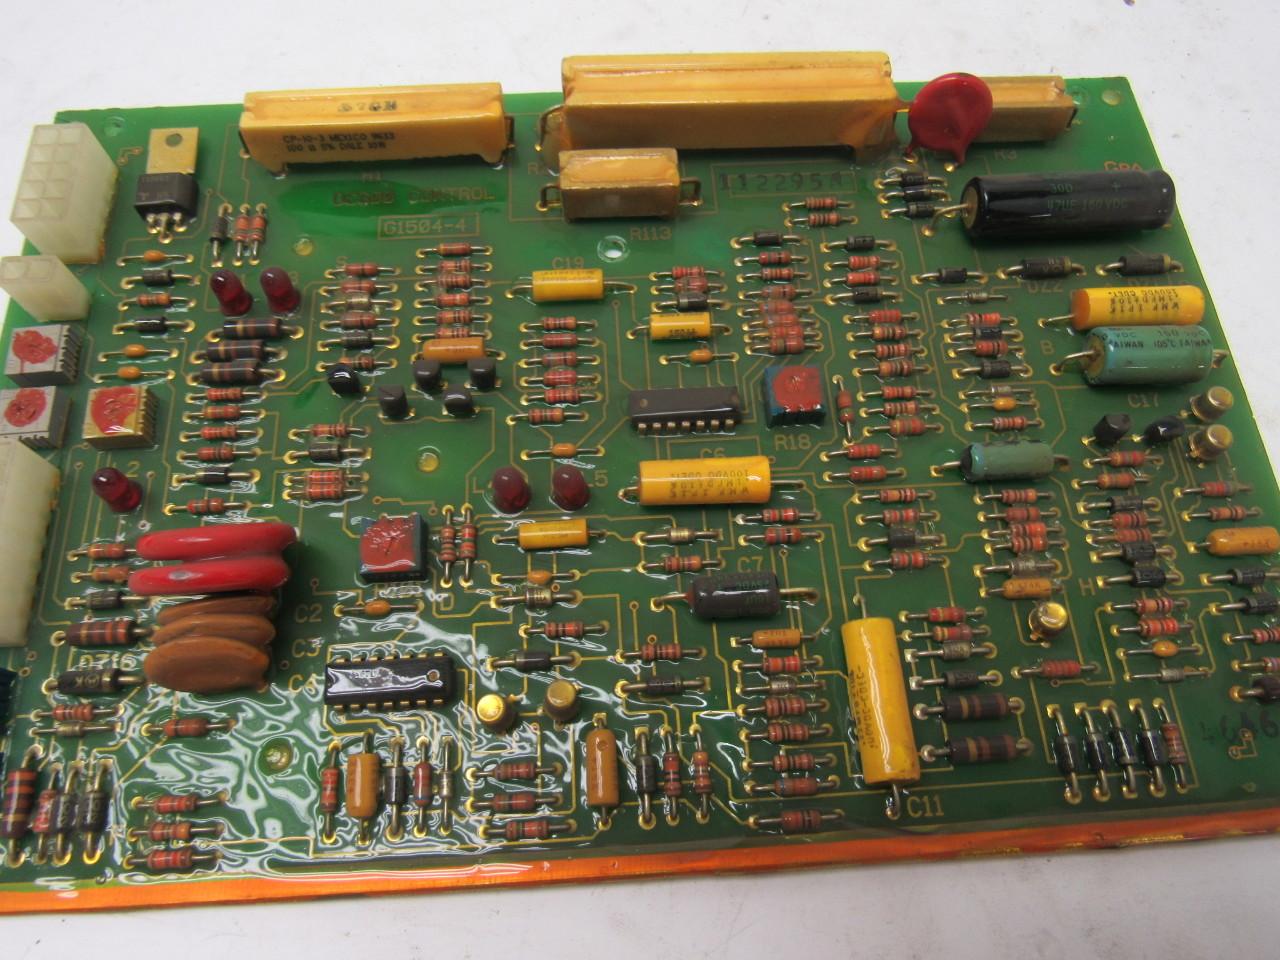 lincoln electric g1504 4 dc600 welder control circuit. Black Bedroom Furniture Sets. Home Design Ideas